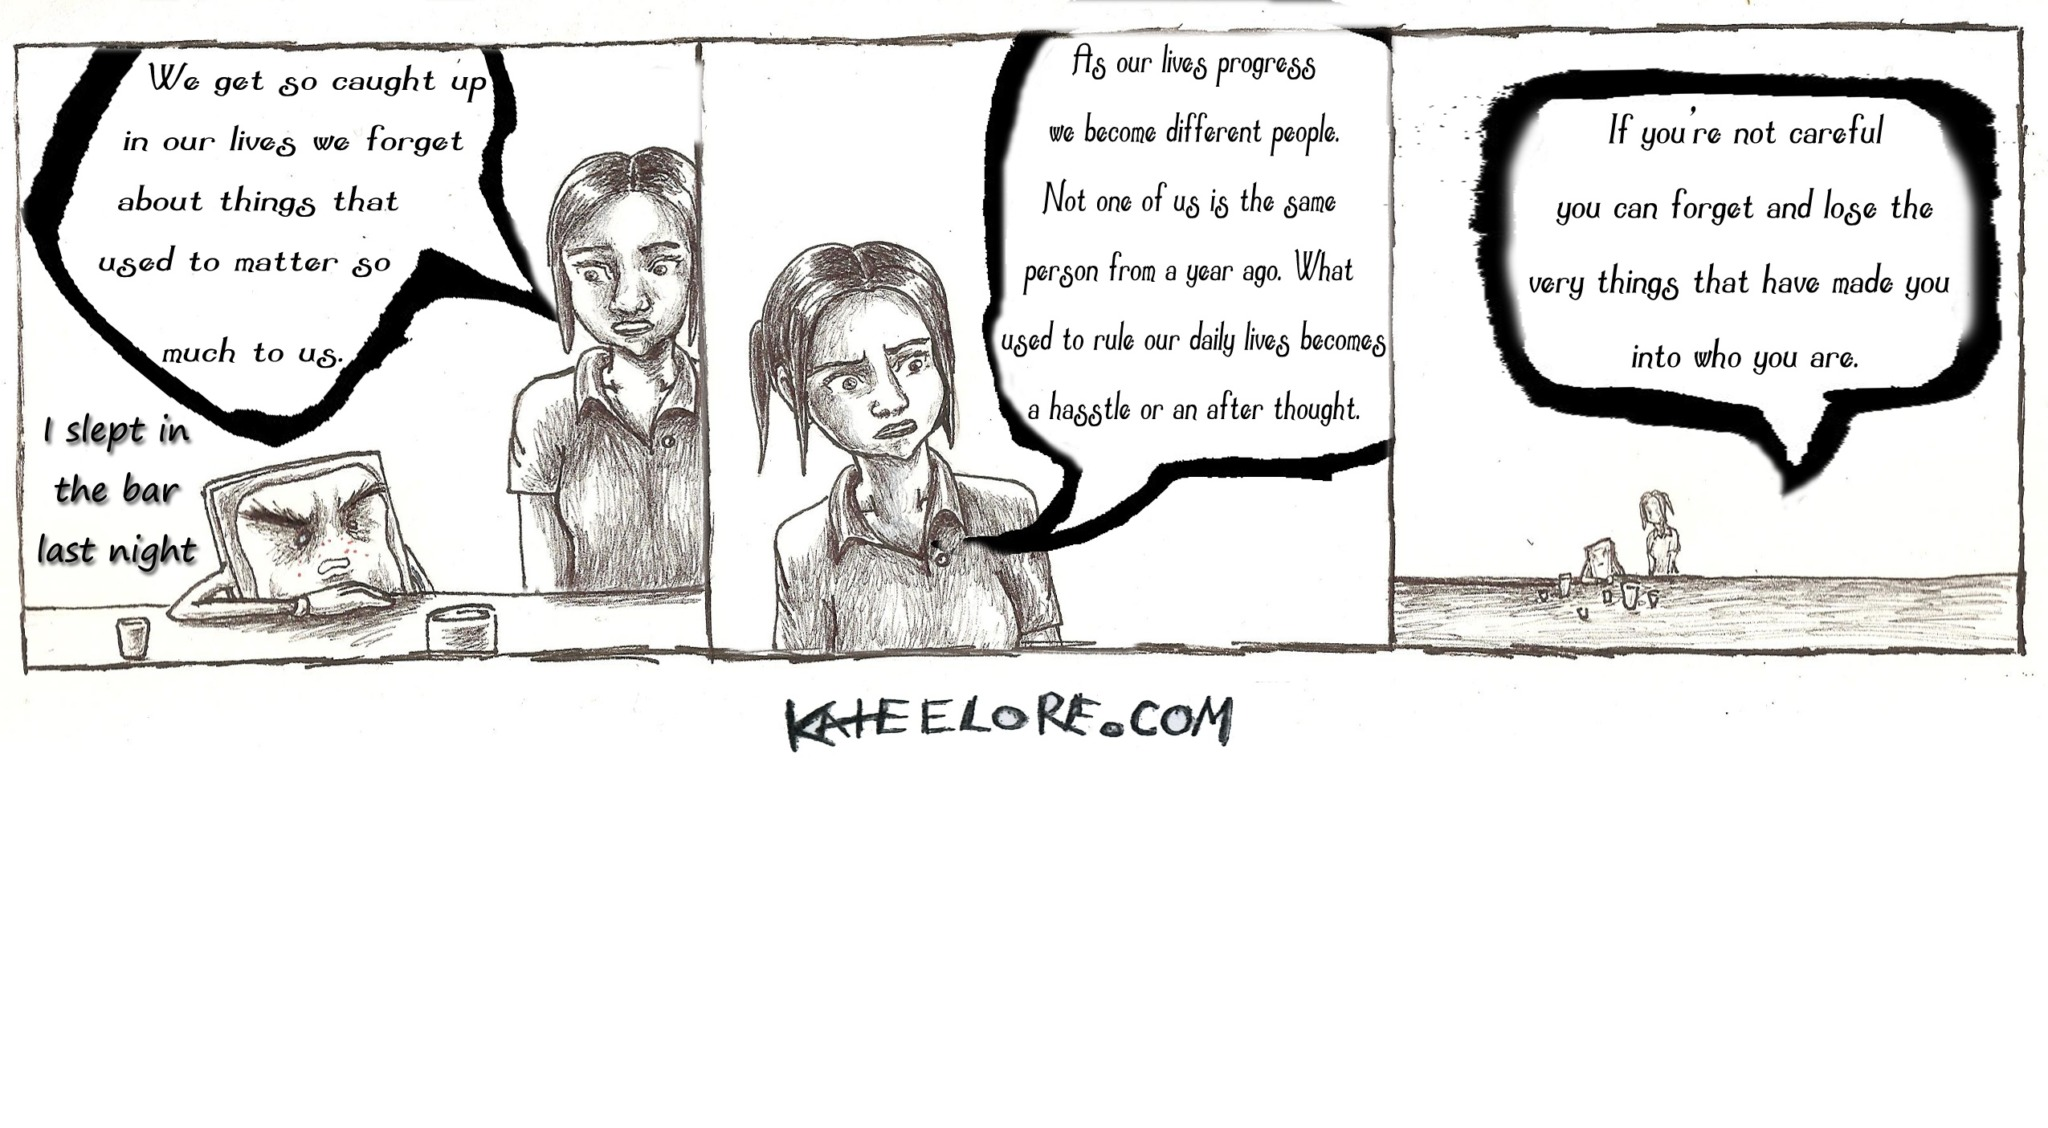 kateelore.com